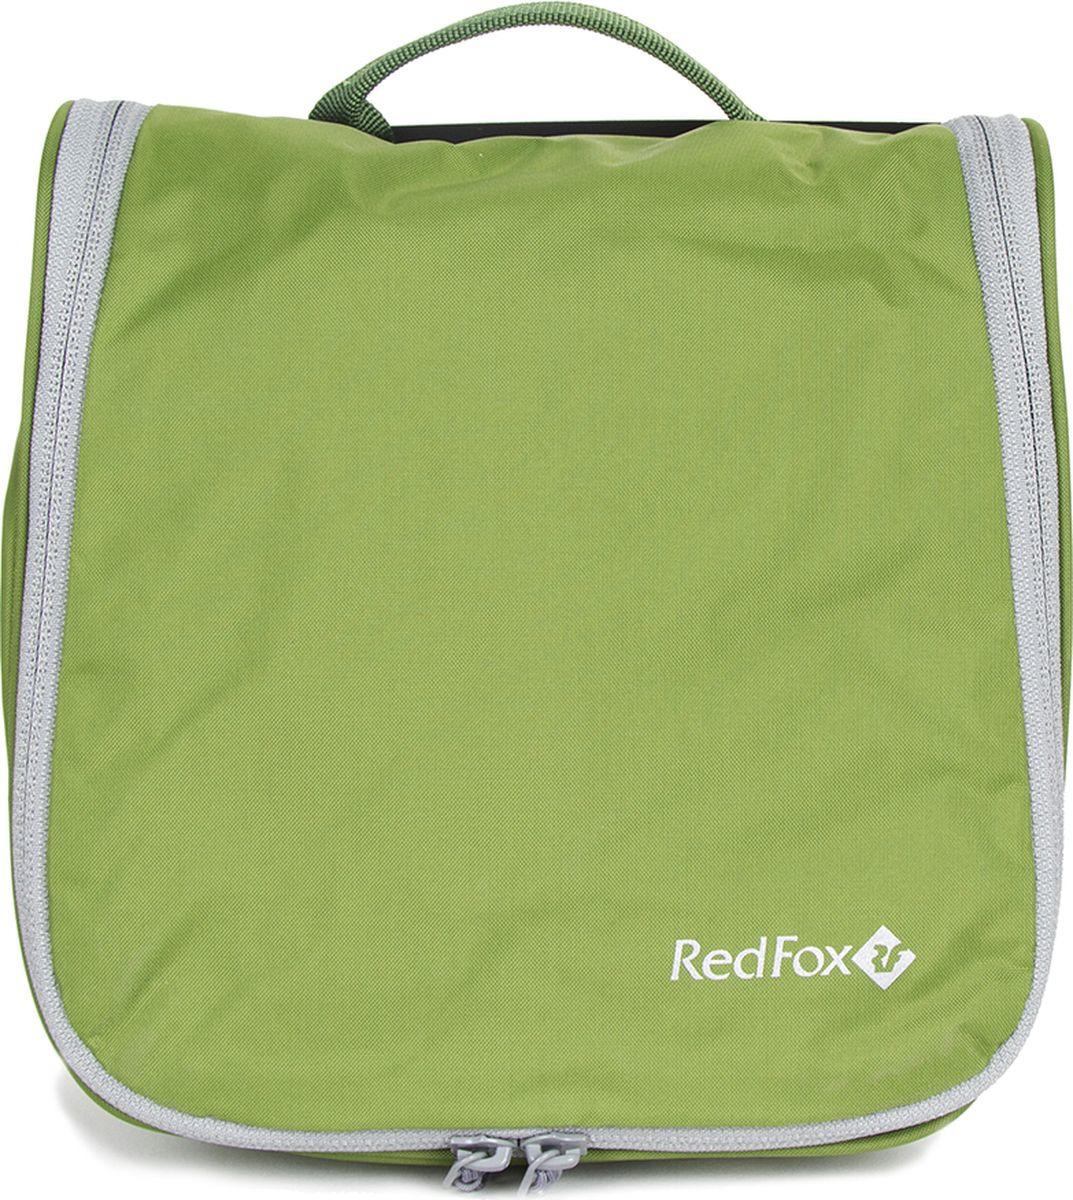 цены на Сумка дорожная Red Fox Voyager L, 1046752, светло-зеленый, 44 х 20 х 8 см  в интернет-магазинах